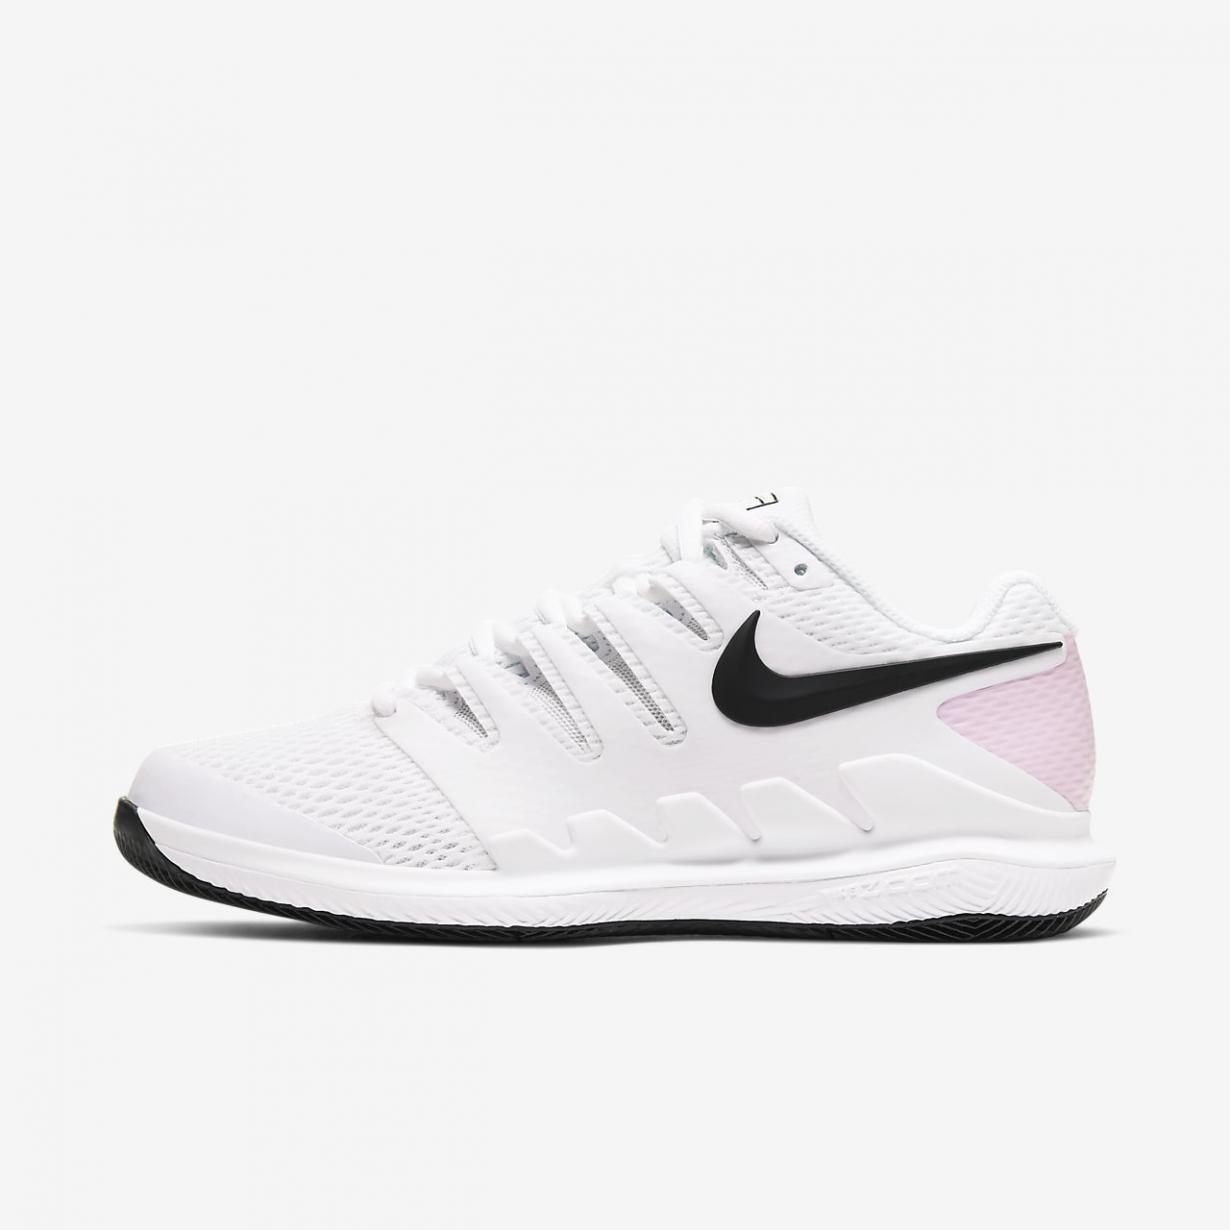 Tennis Femme | NikeCourt Air Zoom Vapor X Blanc/Mousse Rose/Noir | Nike < Gooddaytricities